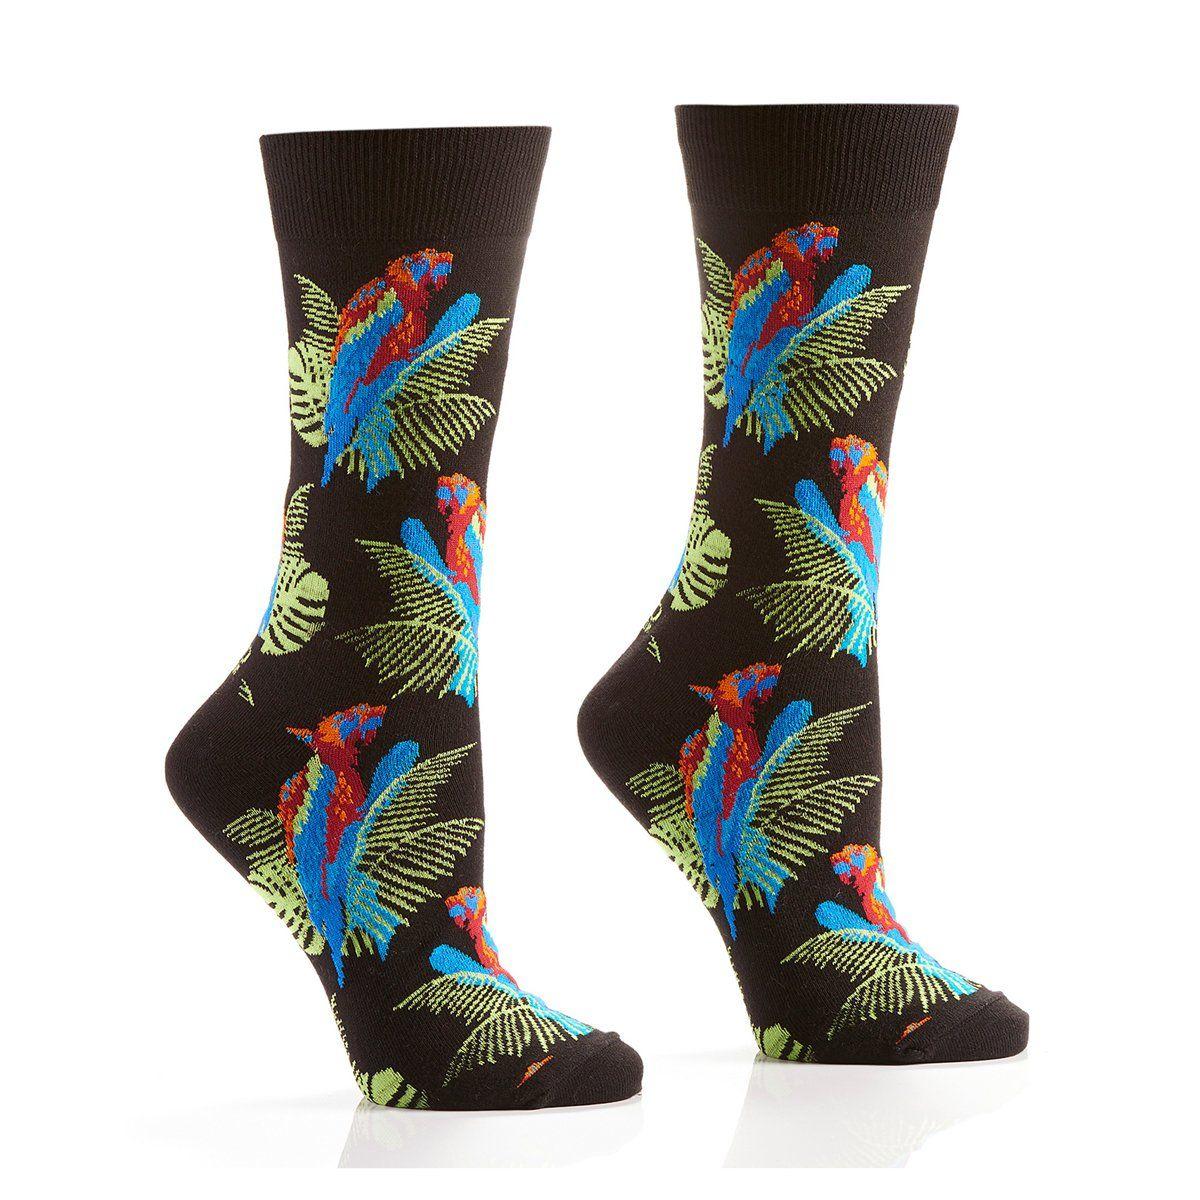 Teal Camo Socks Novelty Crew Socks Size 10-13